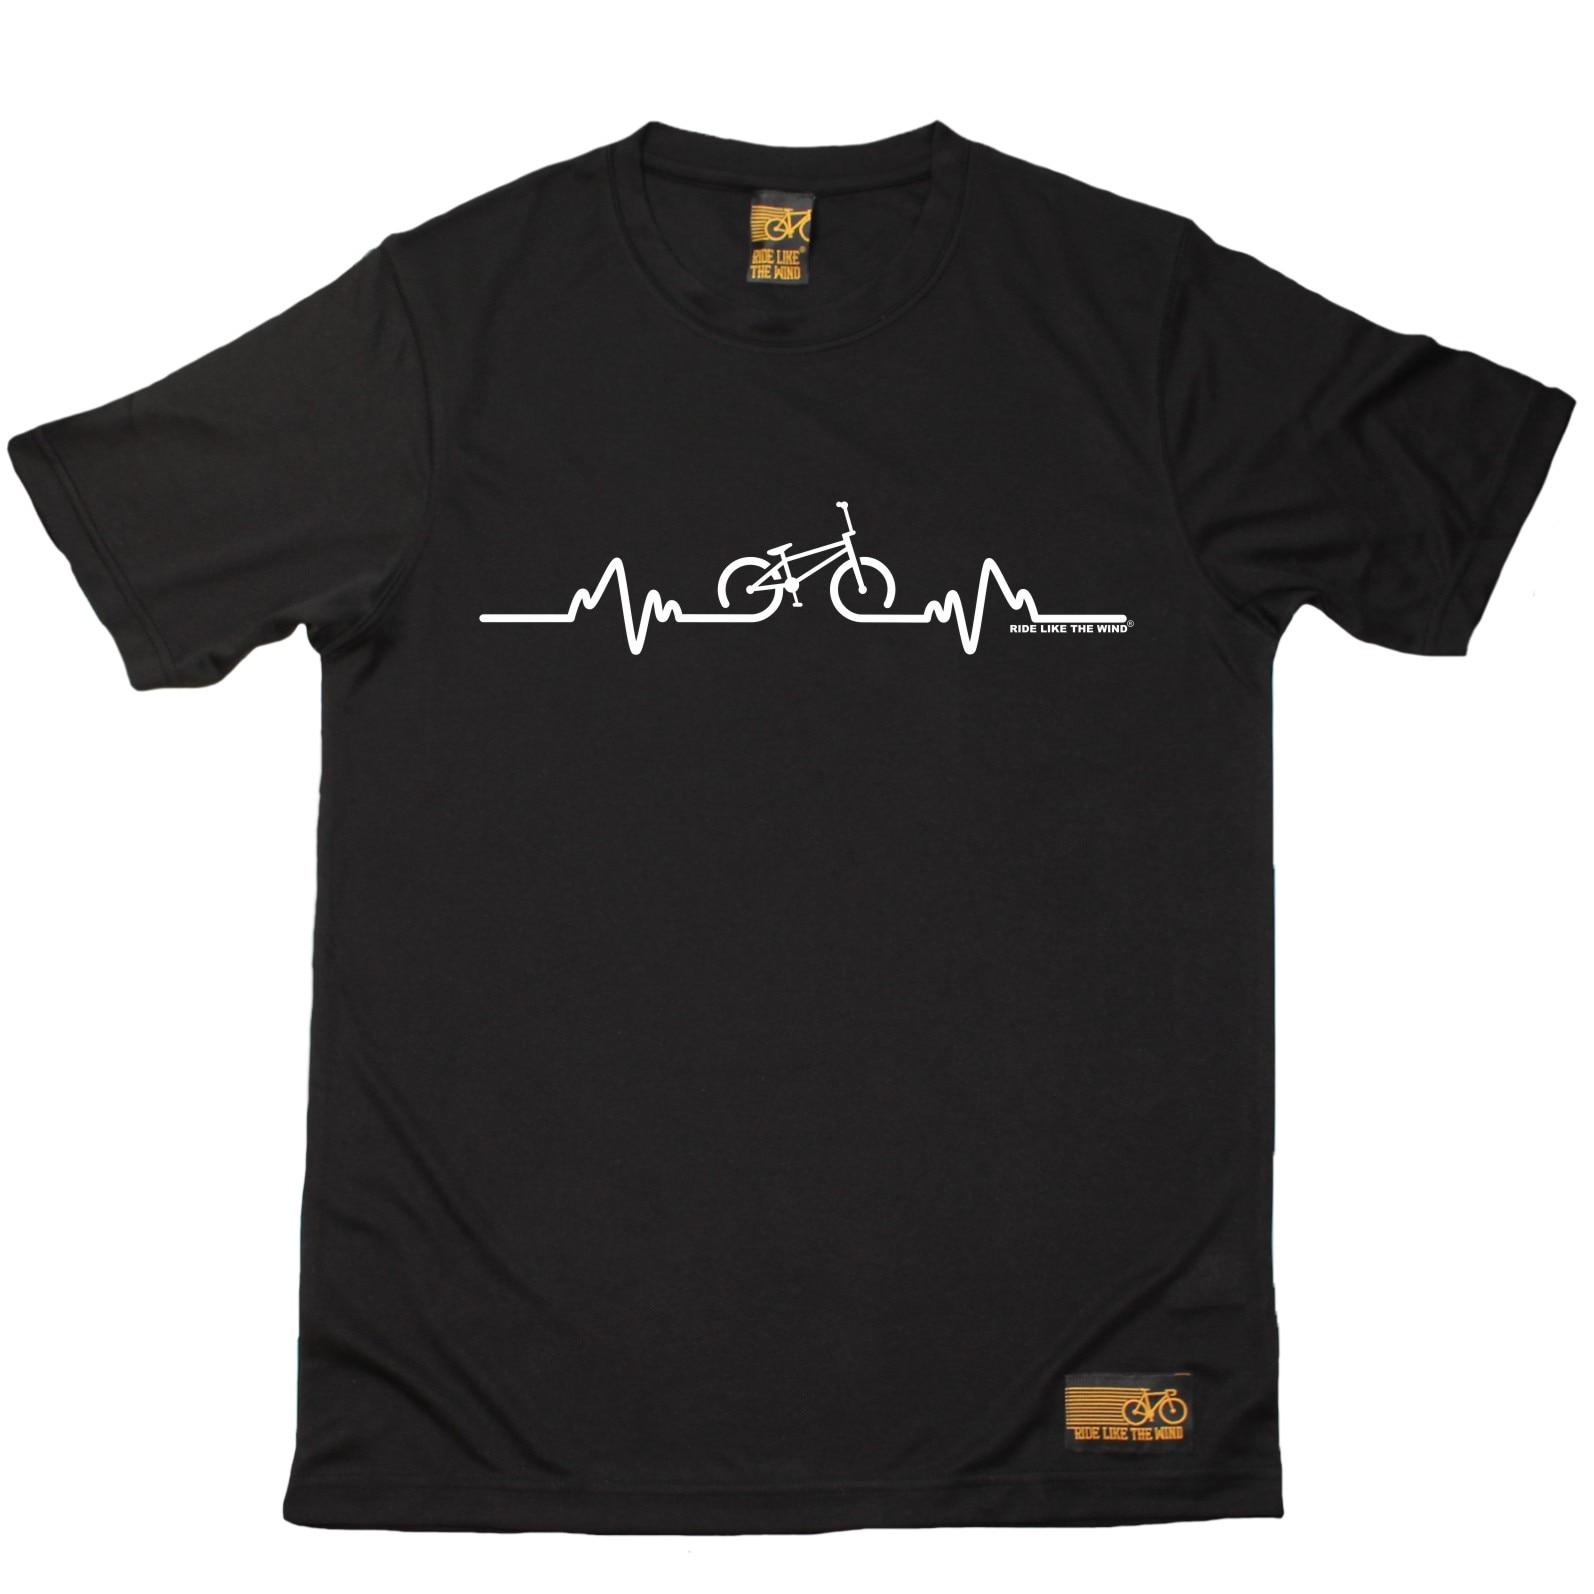 Bicycle BMX Pulse - Breathable Sportser T-SHIRT Cyclinger Birthday Gift Present Biker Short Sleeve O-Neck Cotton T Shirt